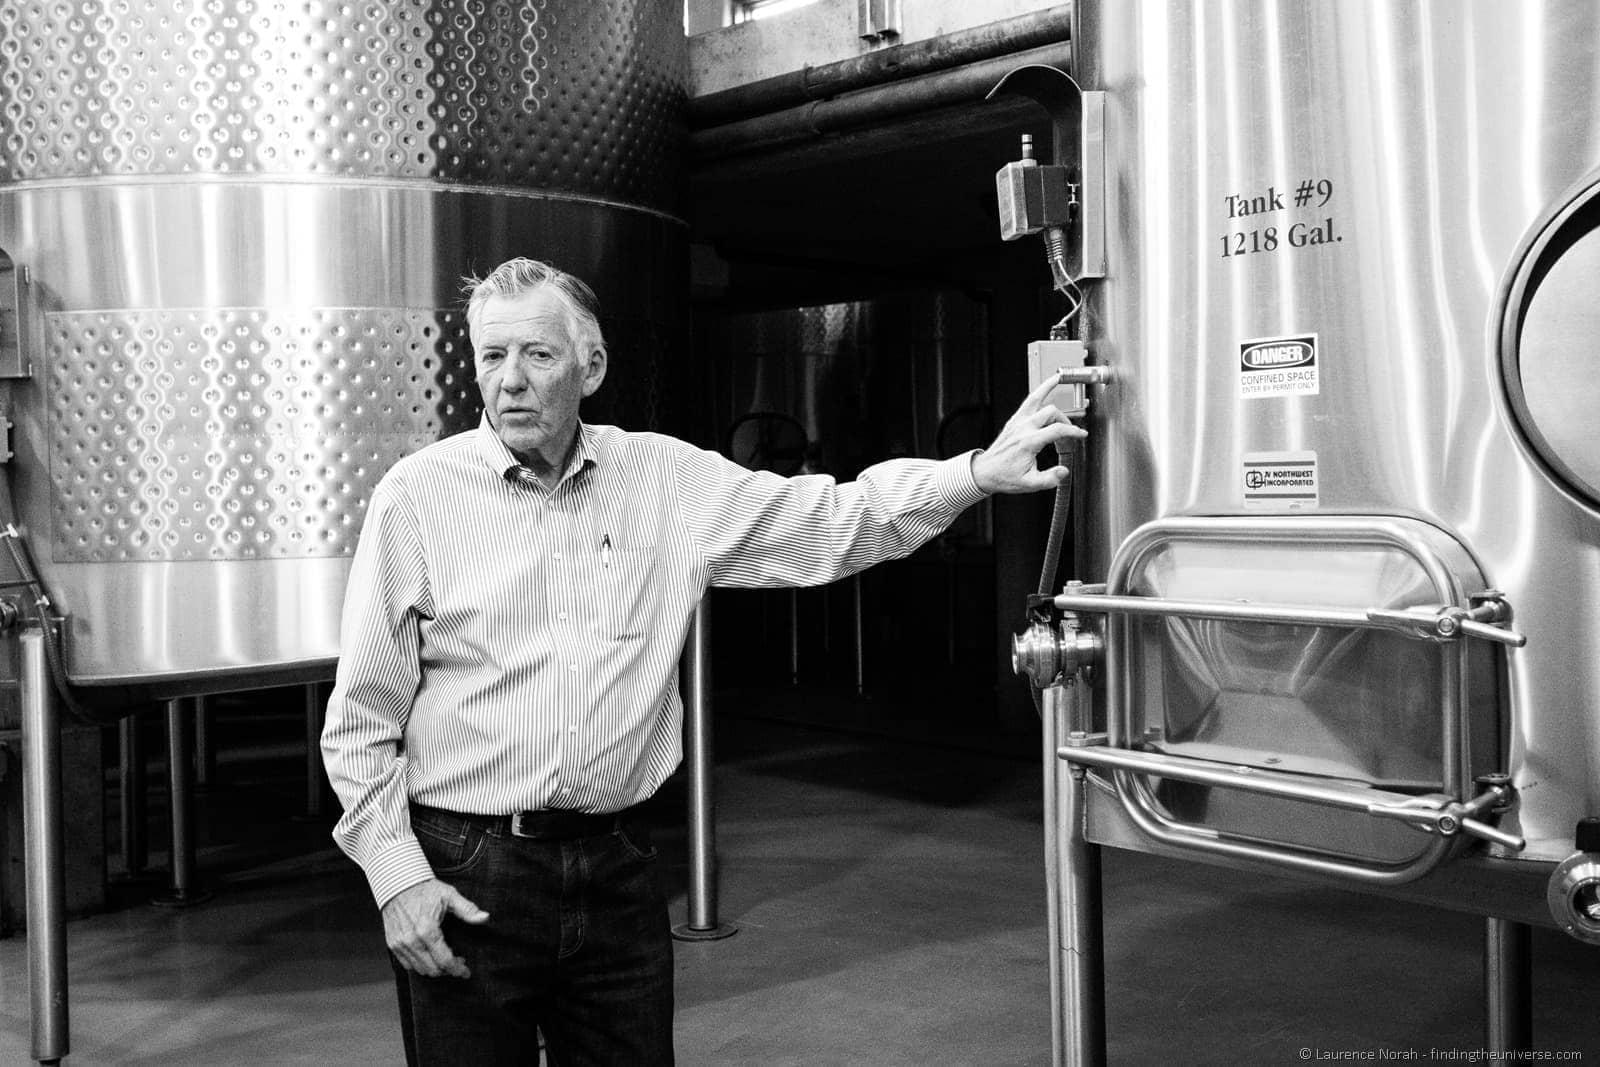 Norm McKibben Pepperbridge Winery tour Walla Walla